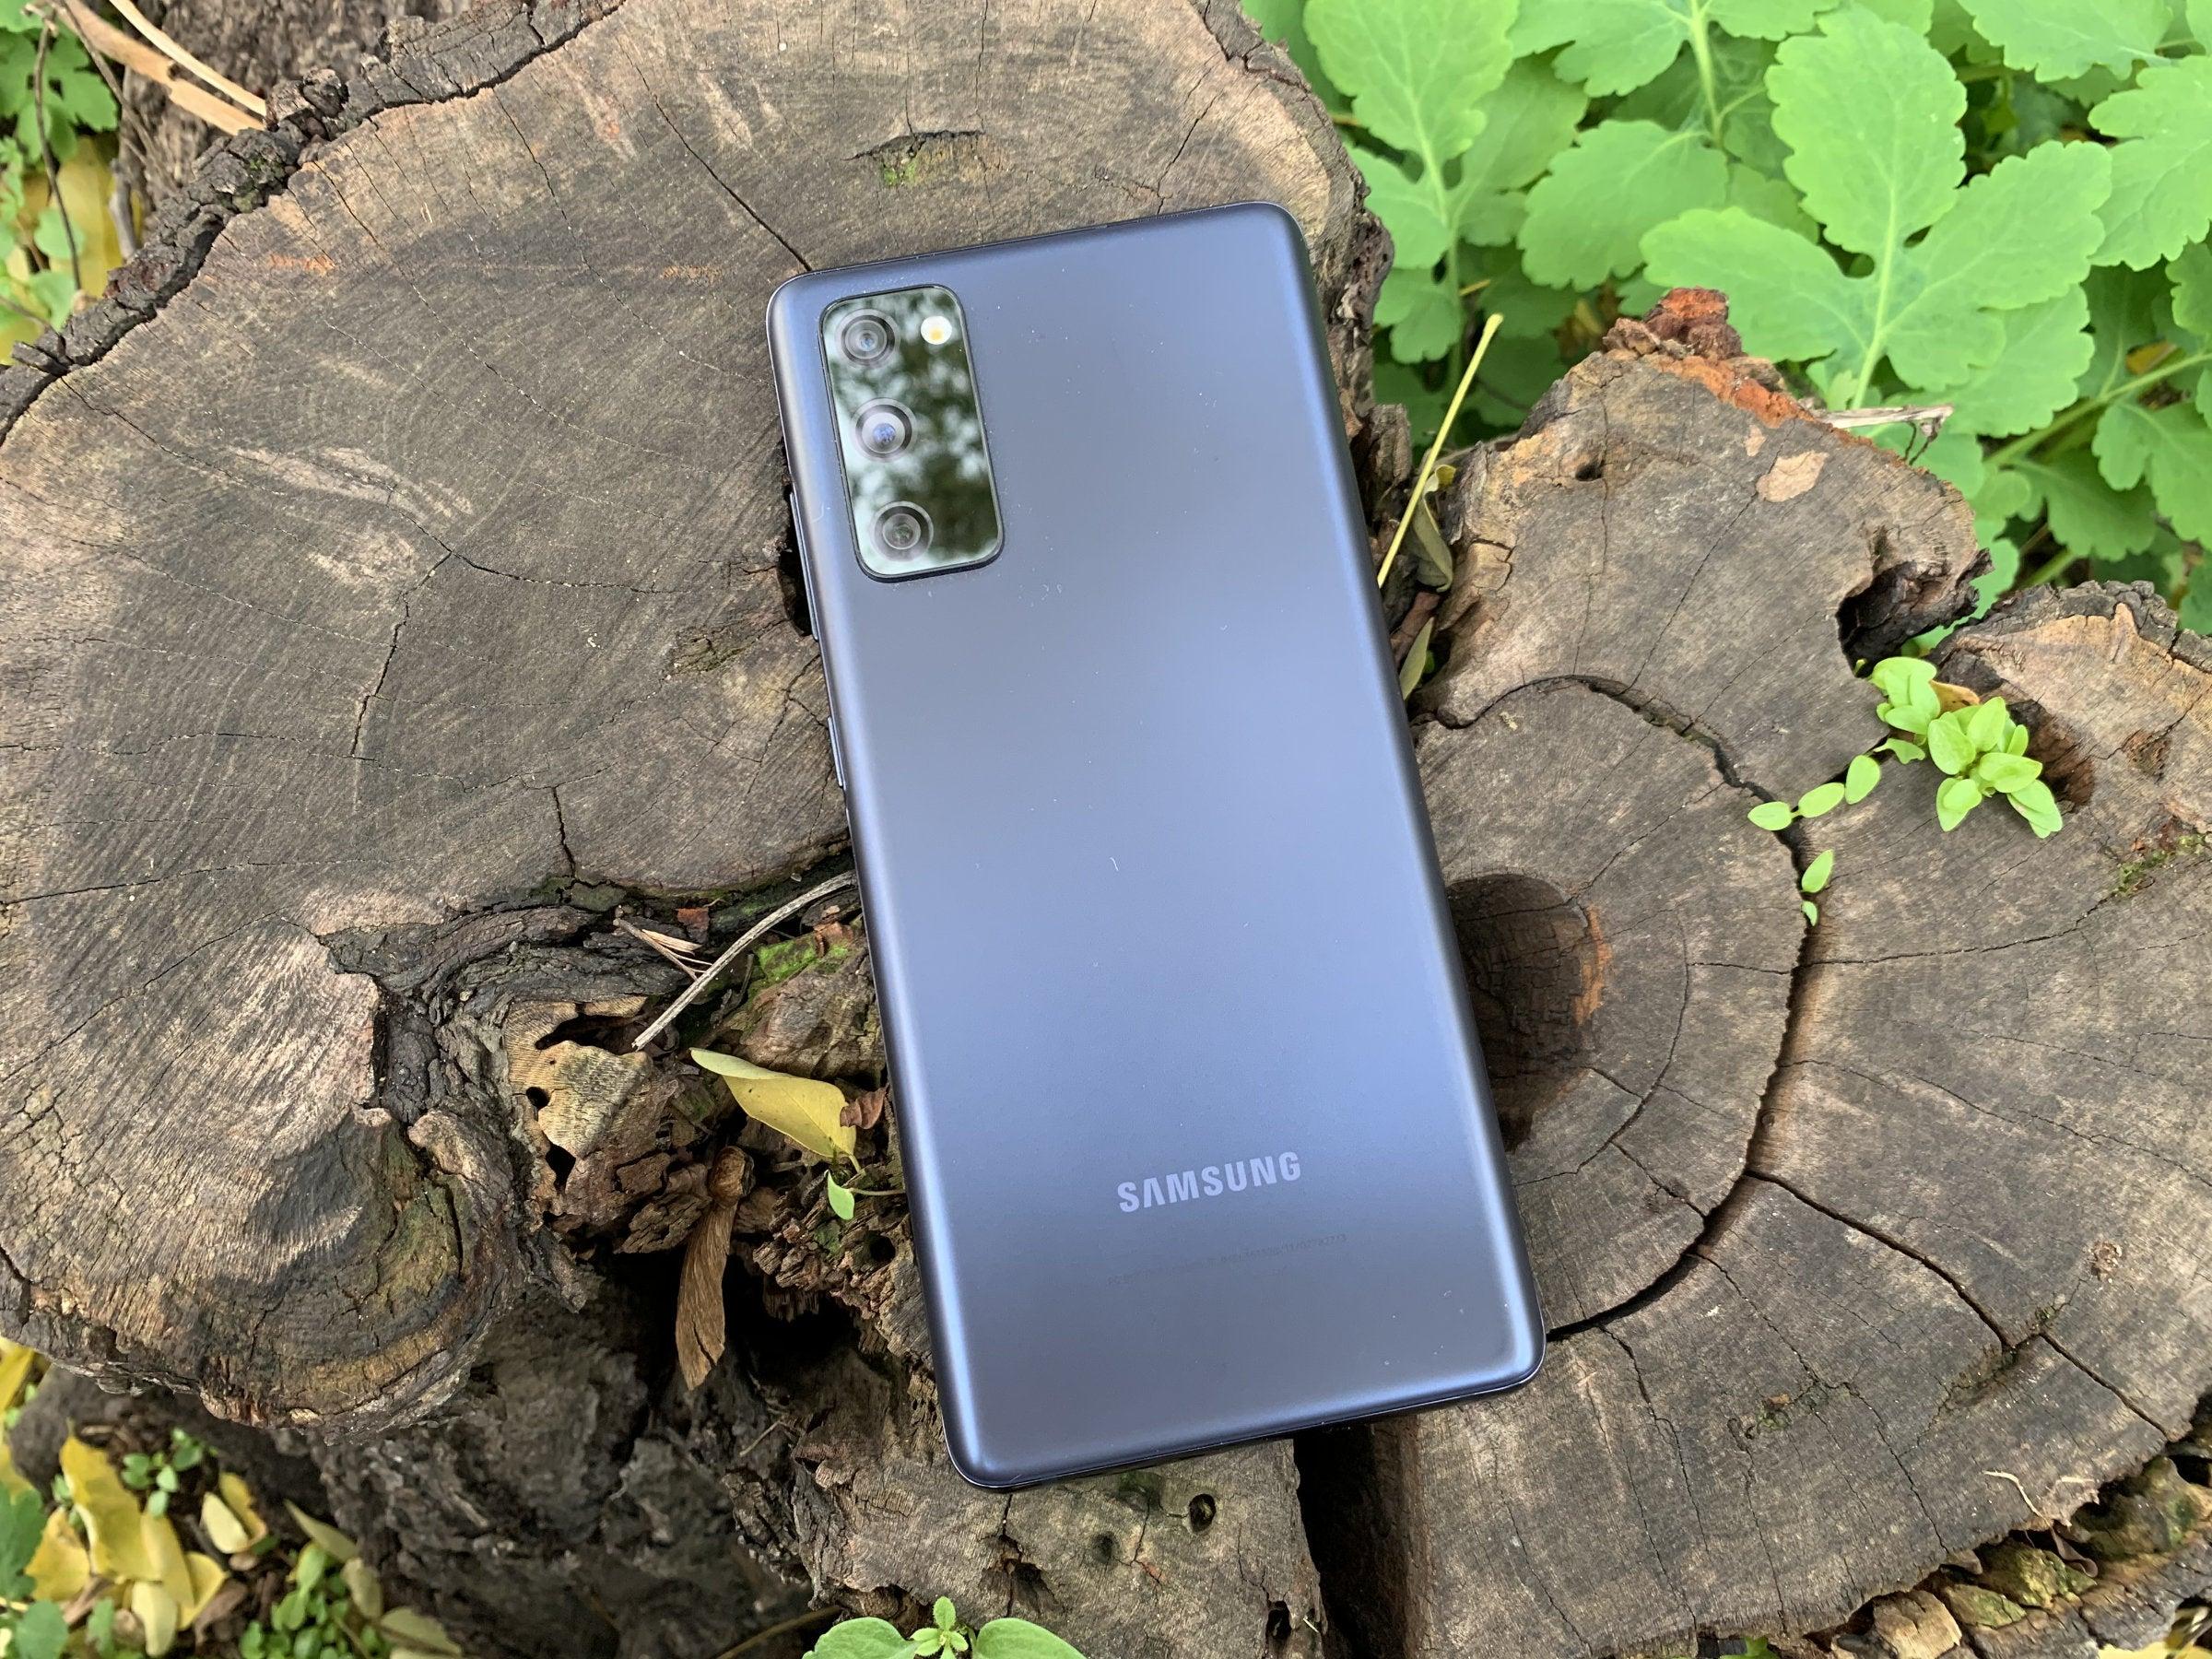 Samsung Galaxy S20 FE mit Top-Tarif für 18 Euro im Monat - inside digital